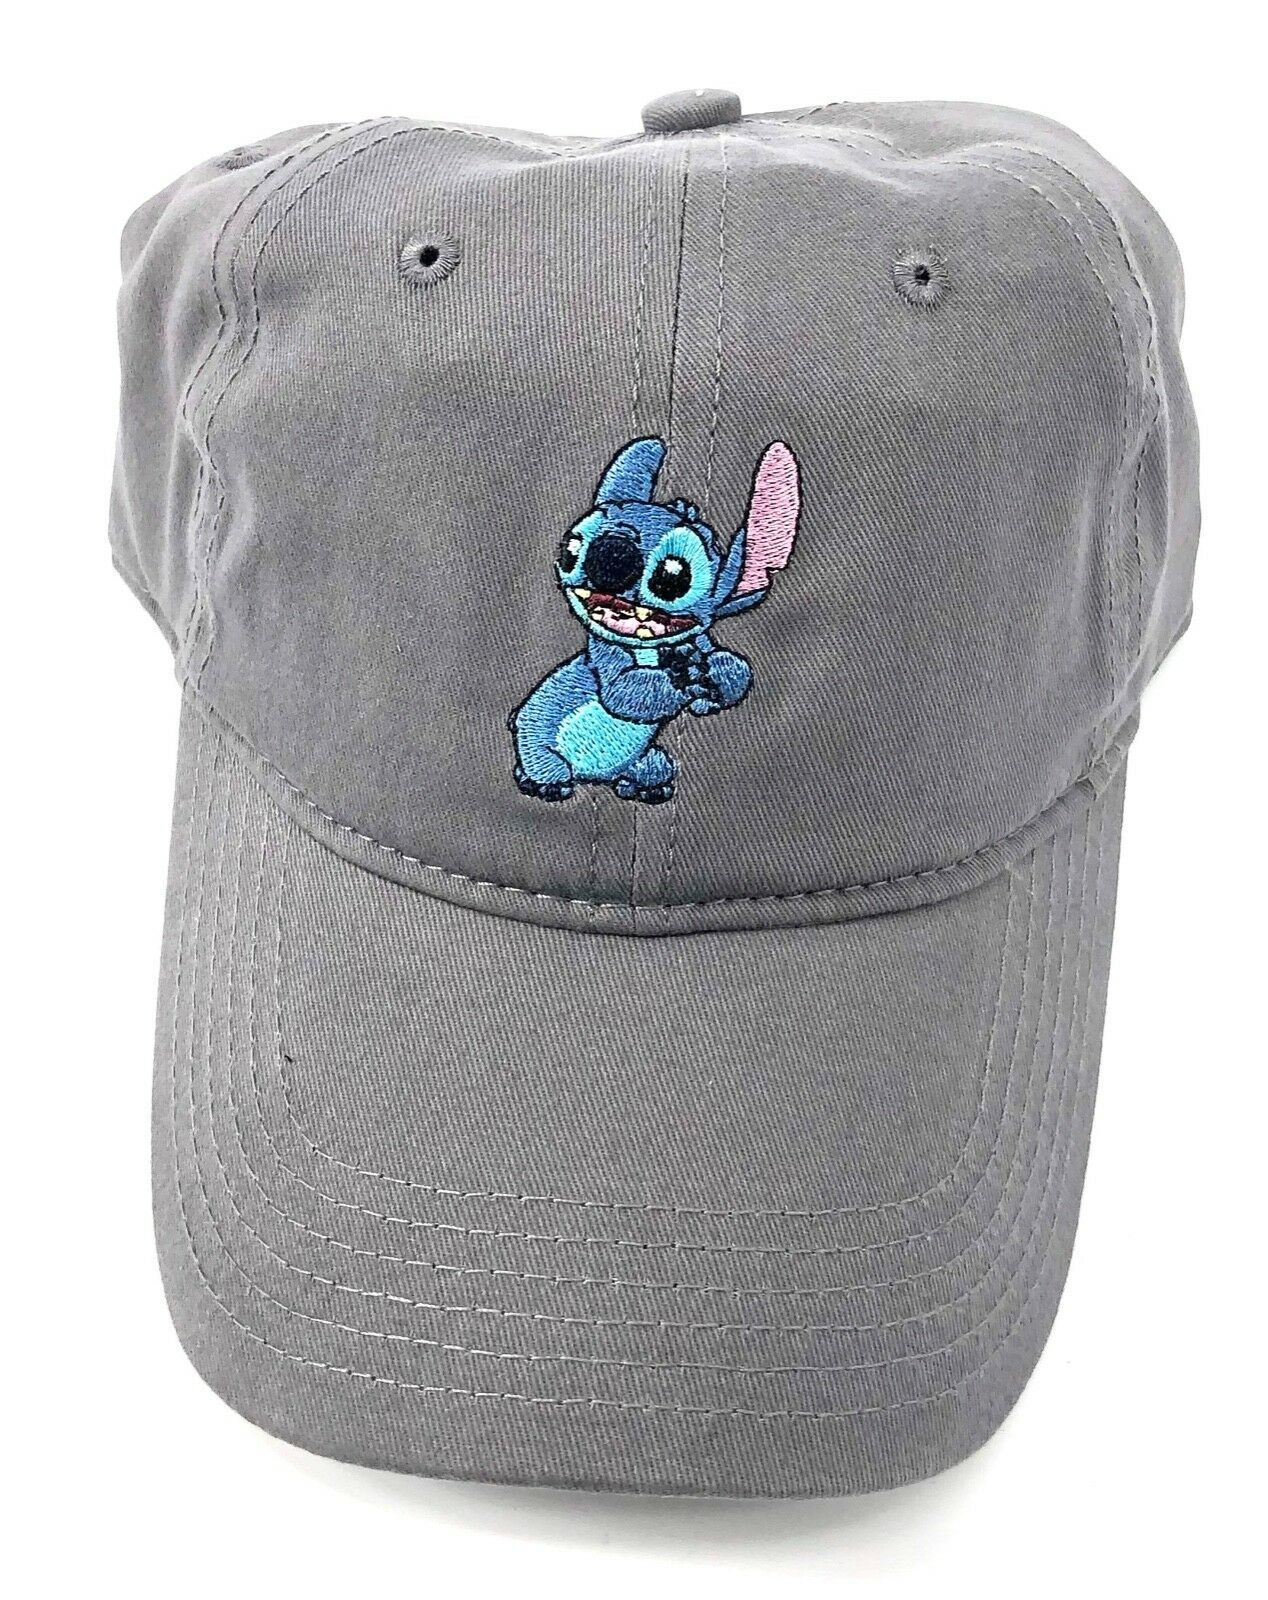 072c1957752 Disney Lilo Stitch Grey Adult Baseball Hat and 32 similar items